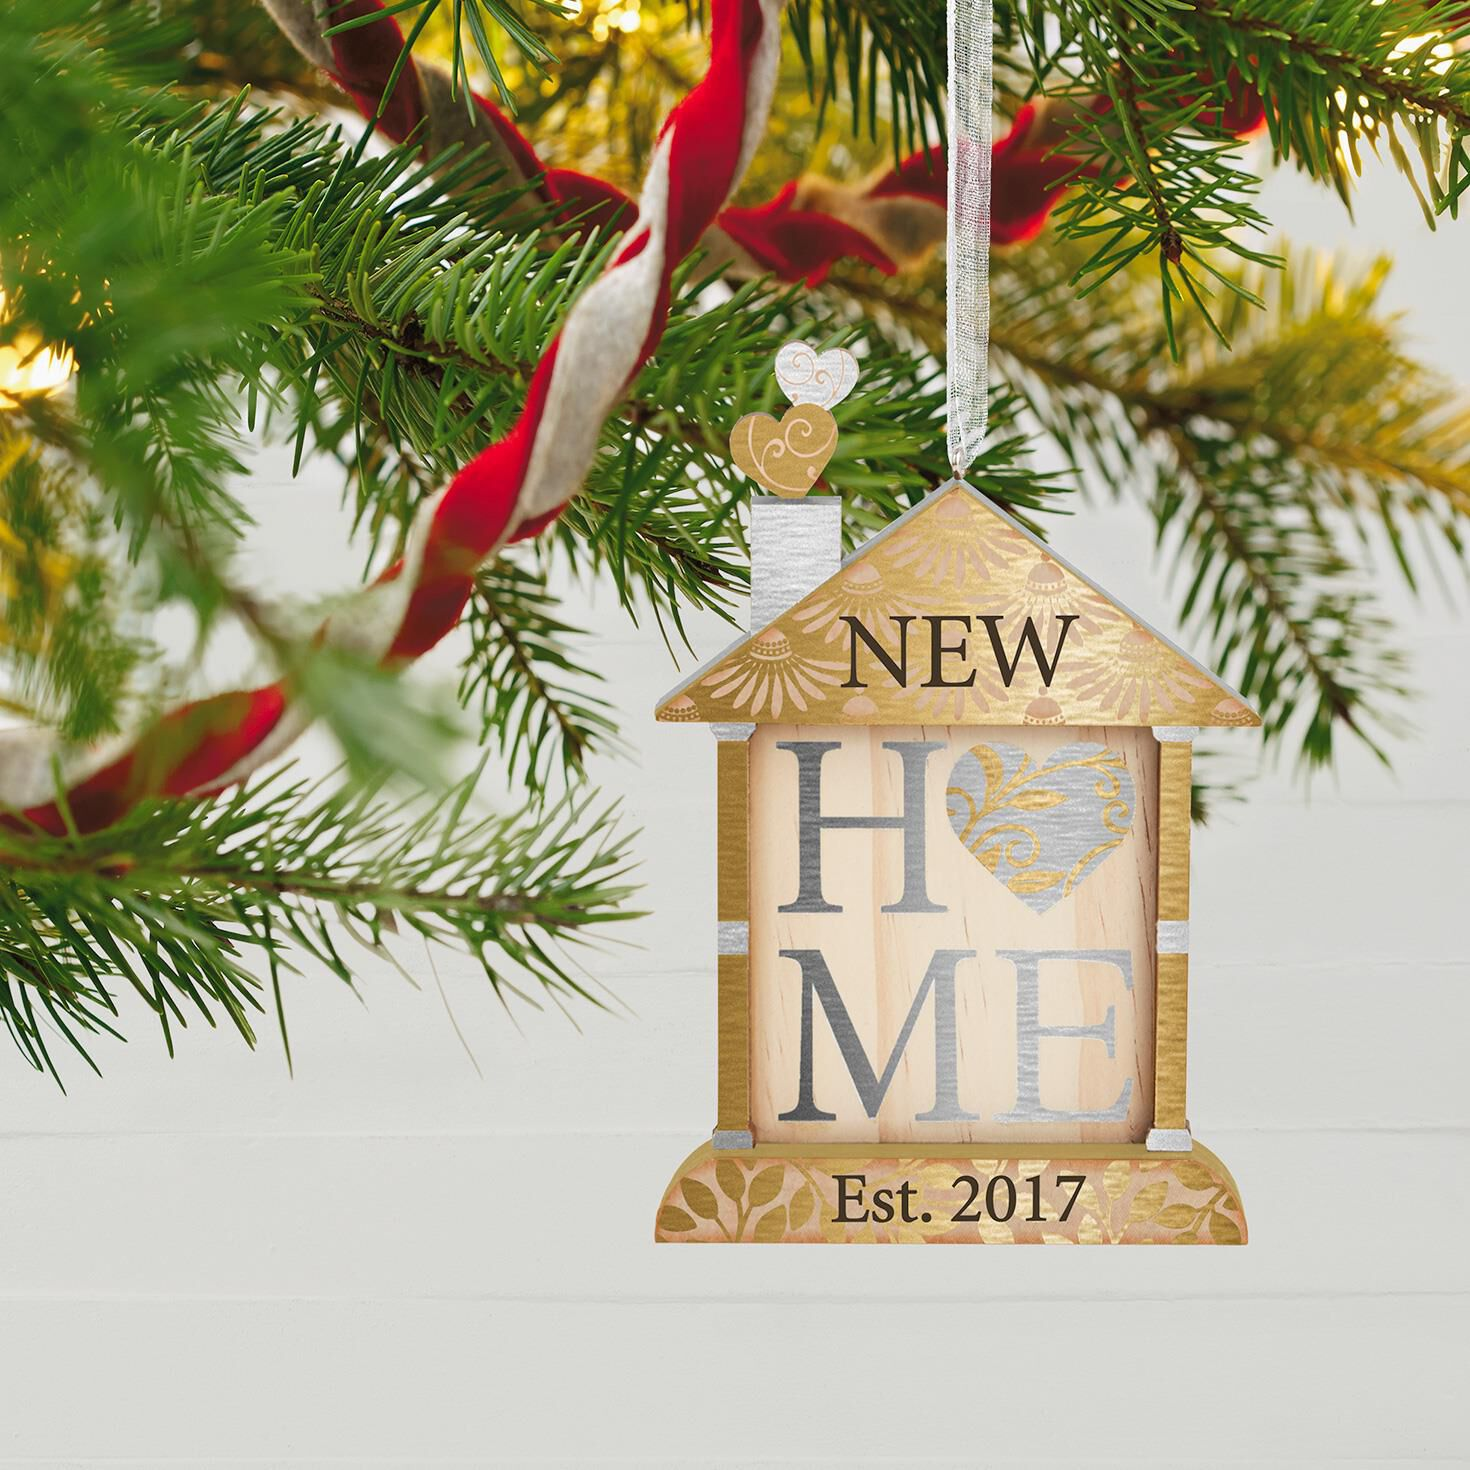 New Home 2017 Ornament - Keepsake Ornaments - Hallmark